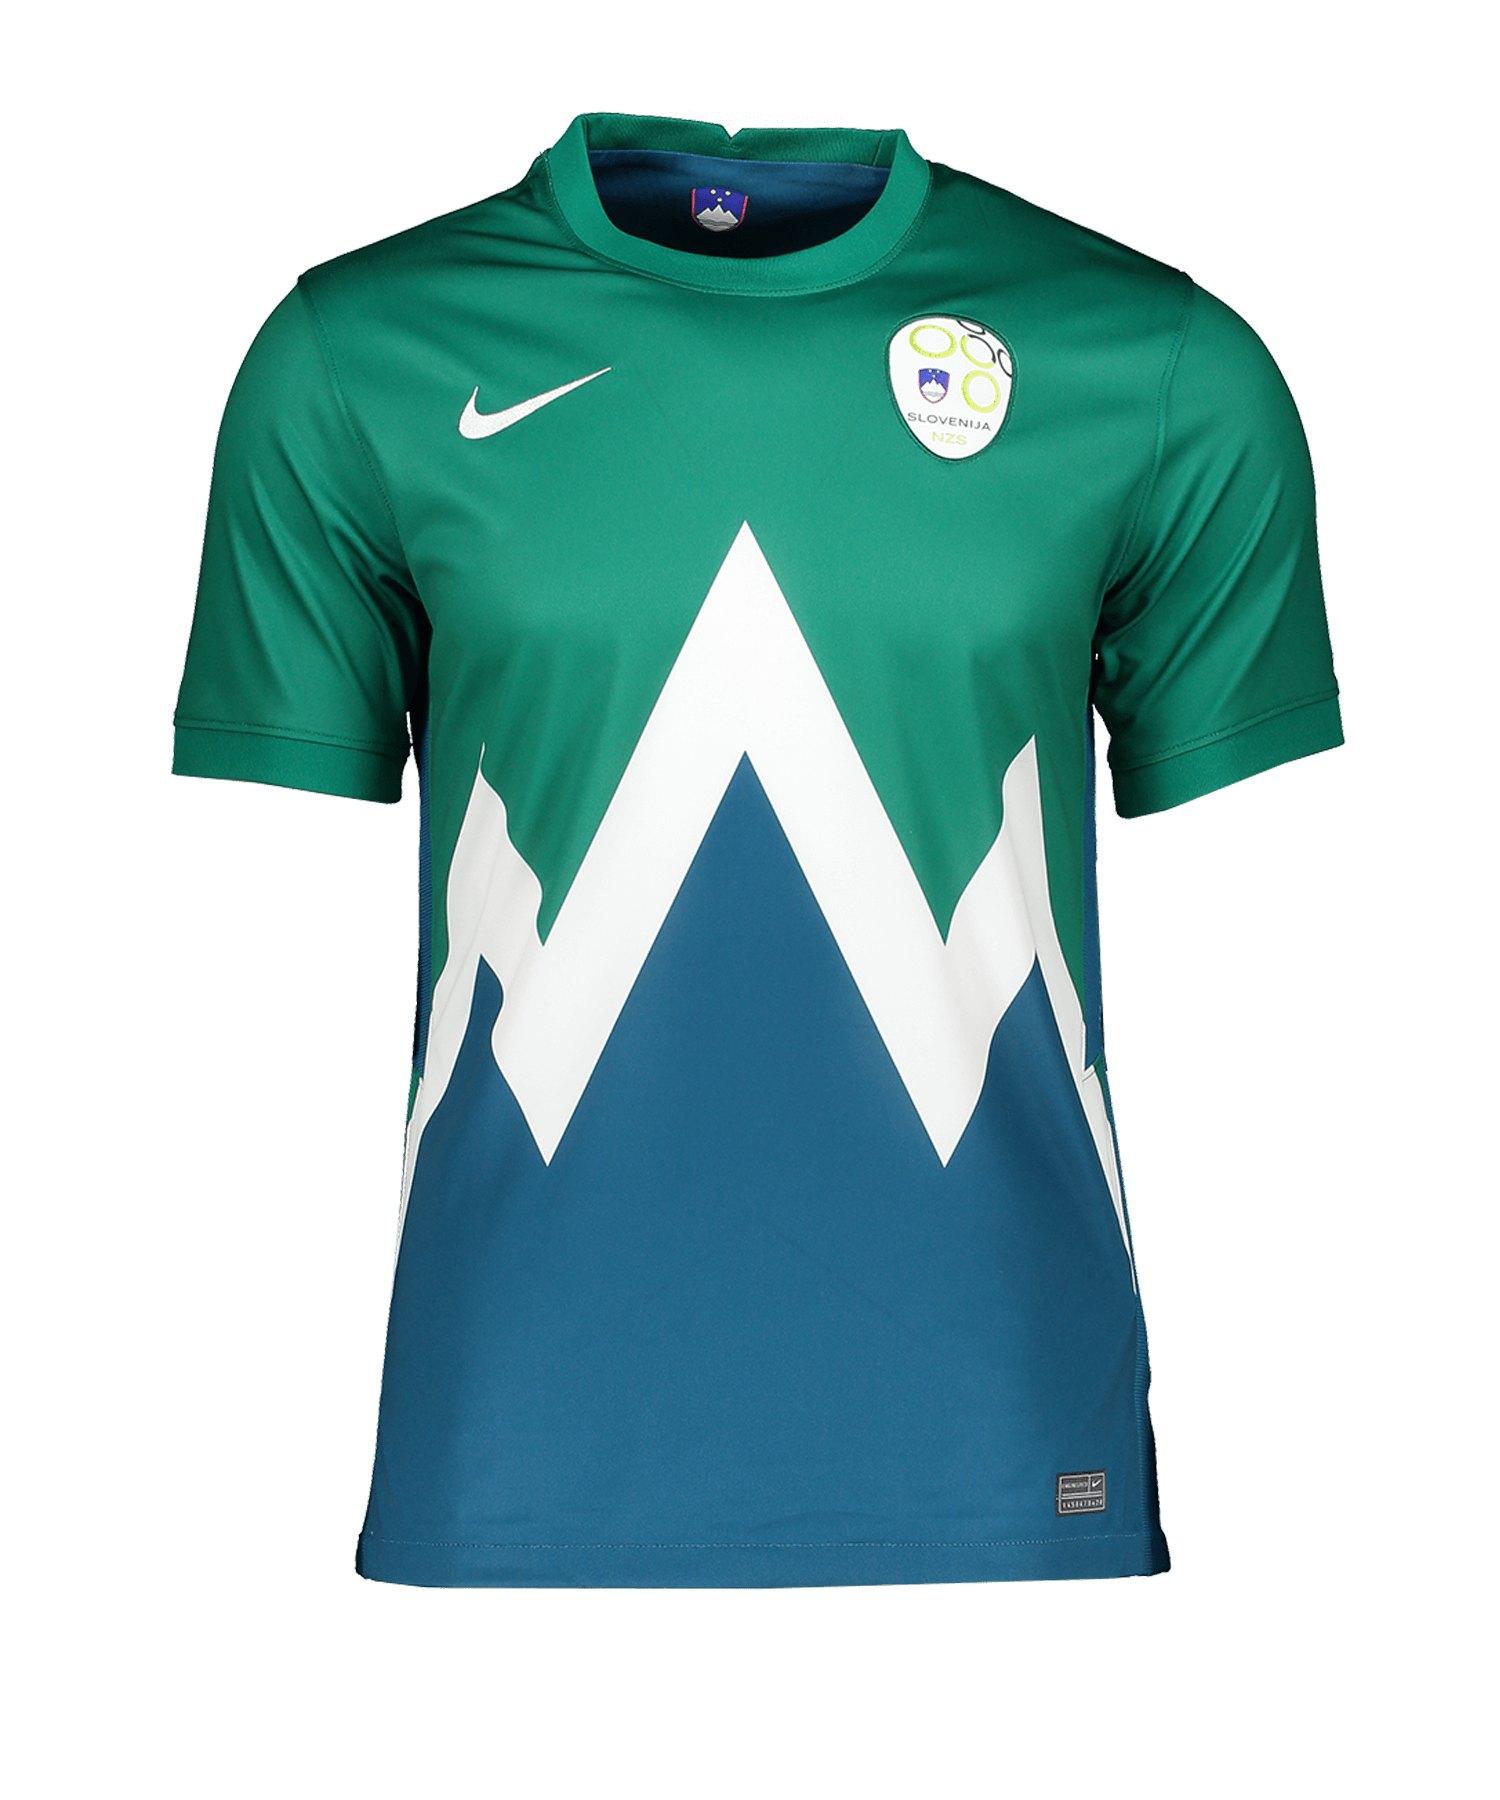 Nike Slowenien Trikot Away EM 2021 Grün F340 - gruen